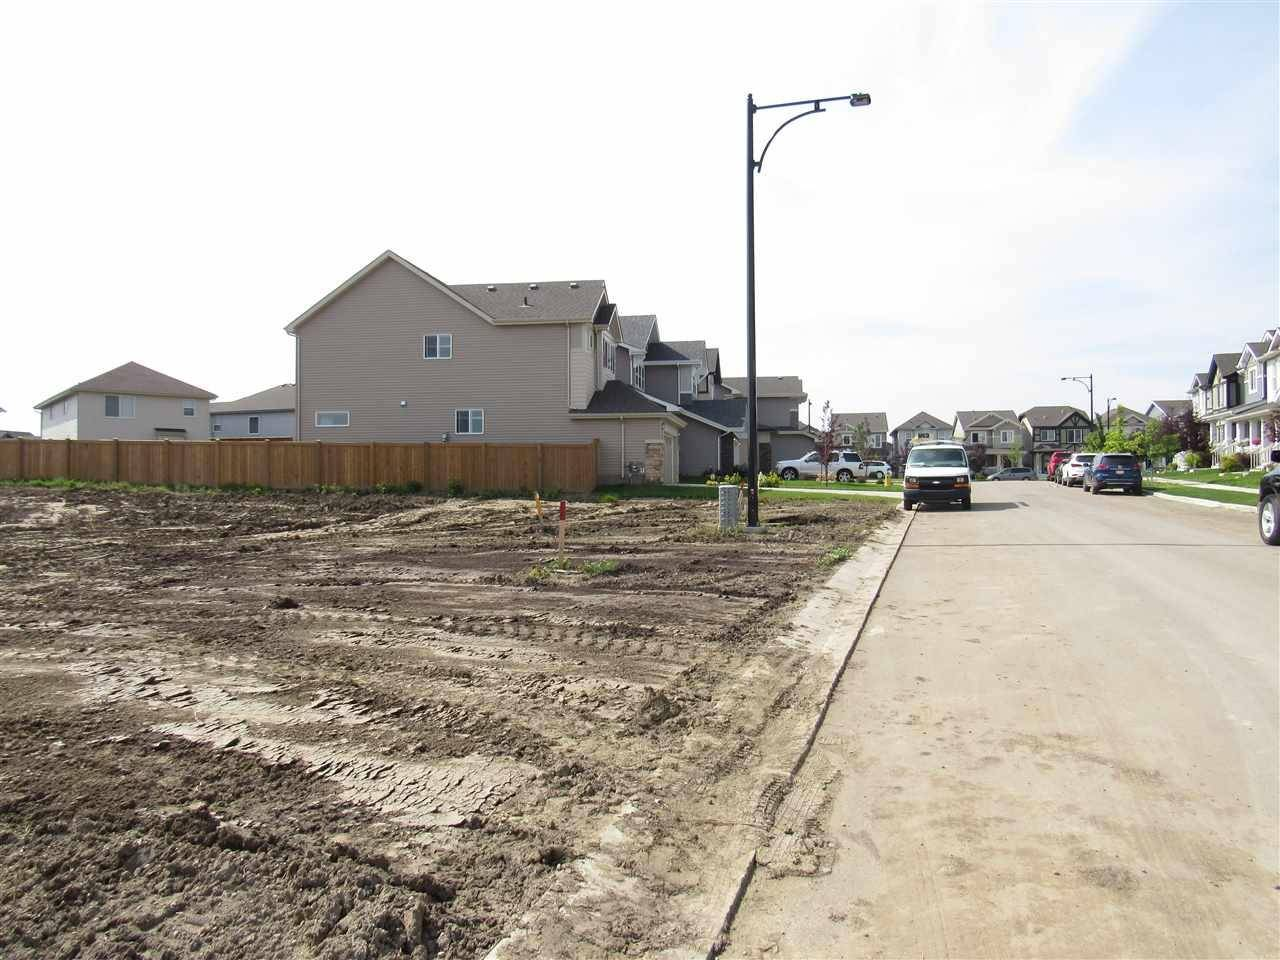 Residential property for sale at 6750 Elston Ln Nw Edmonton Alberta - MLS: E4178121